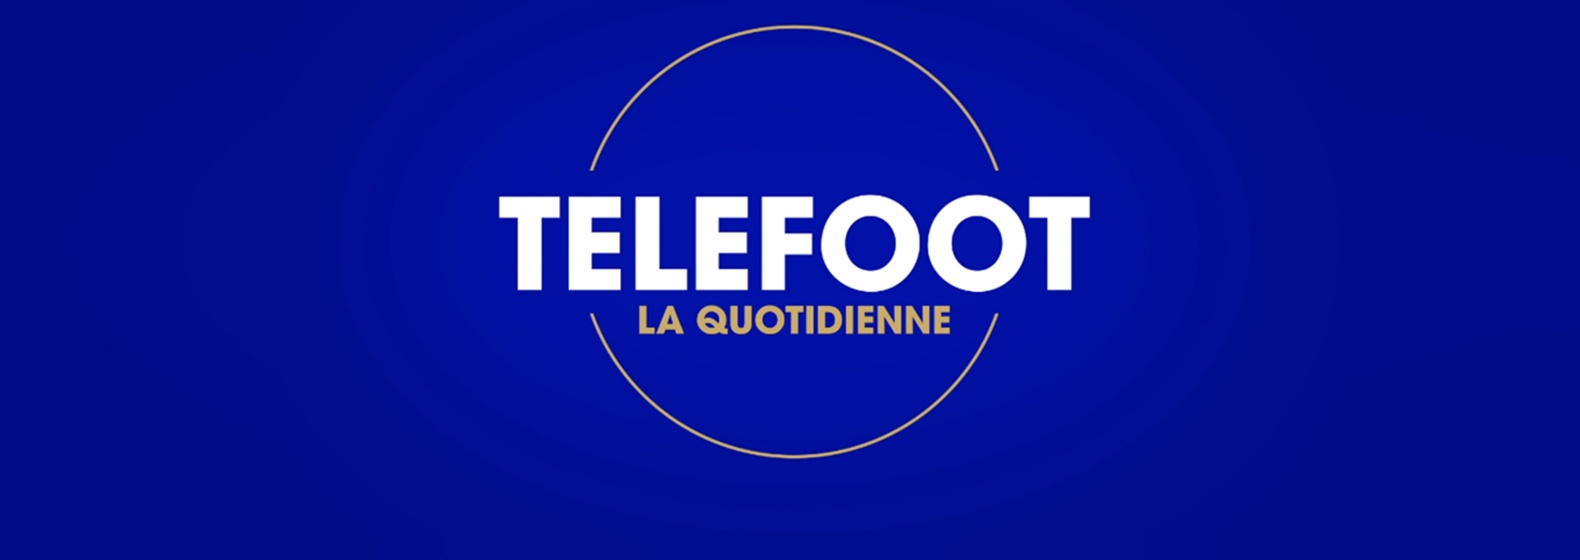 telefoot3-.jpg